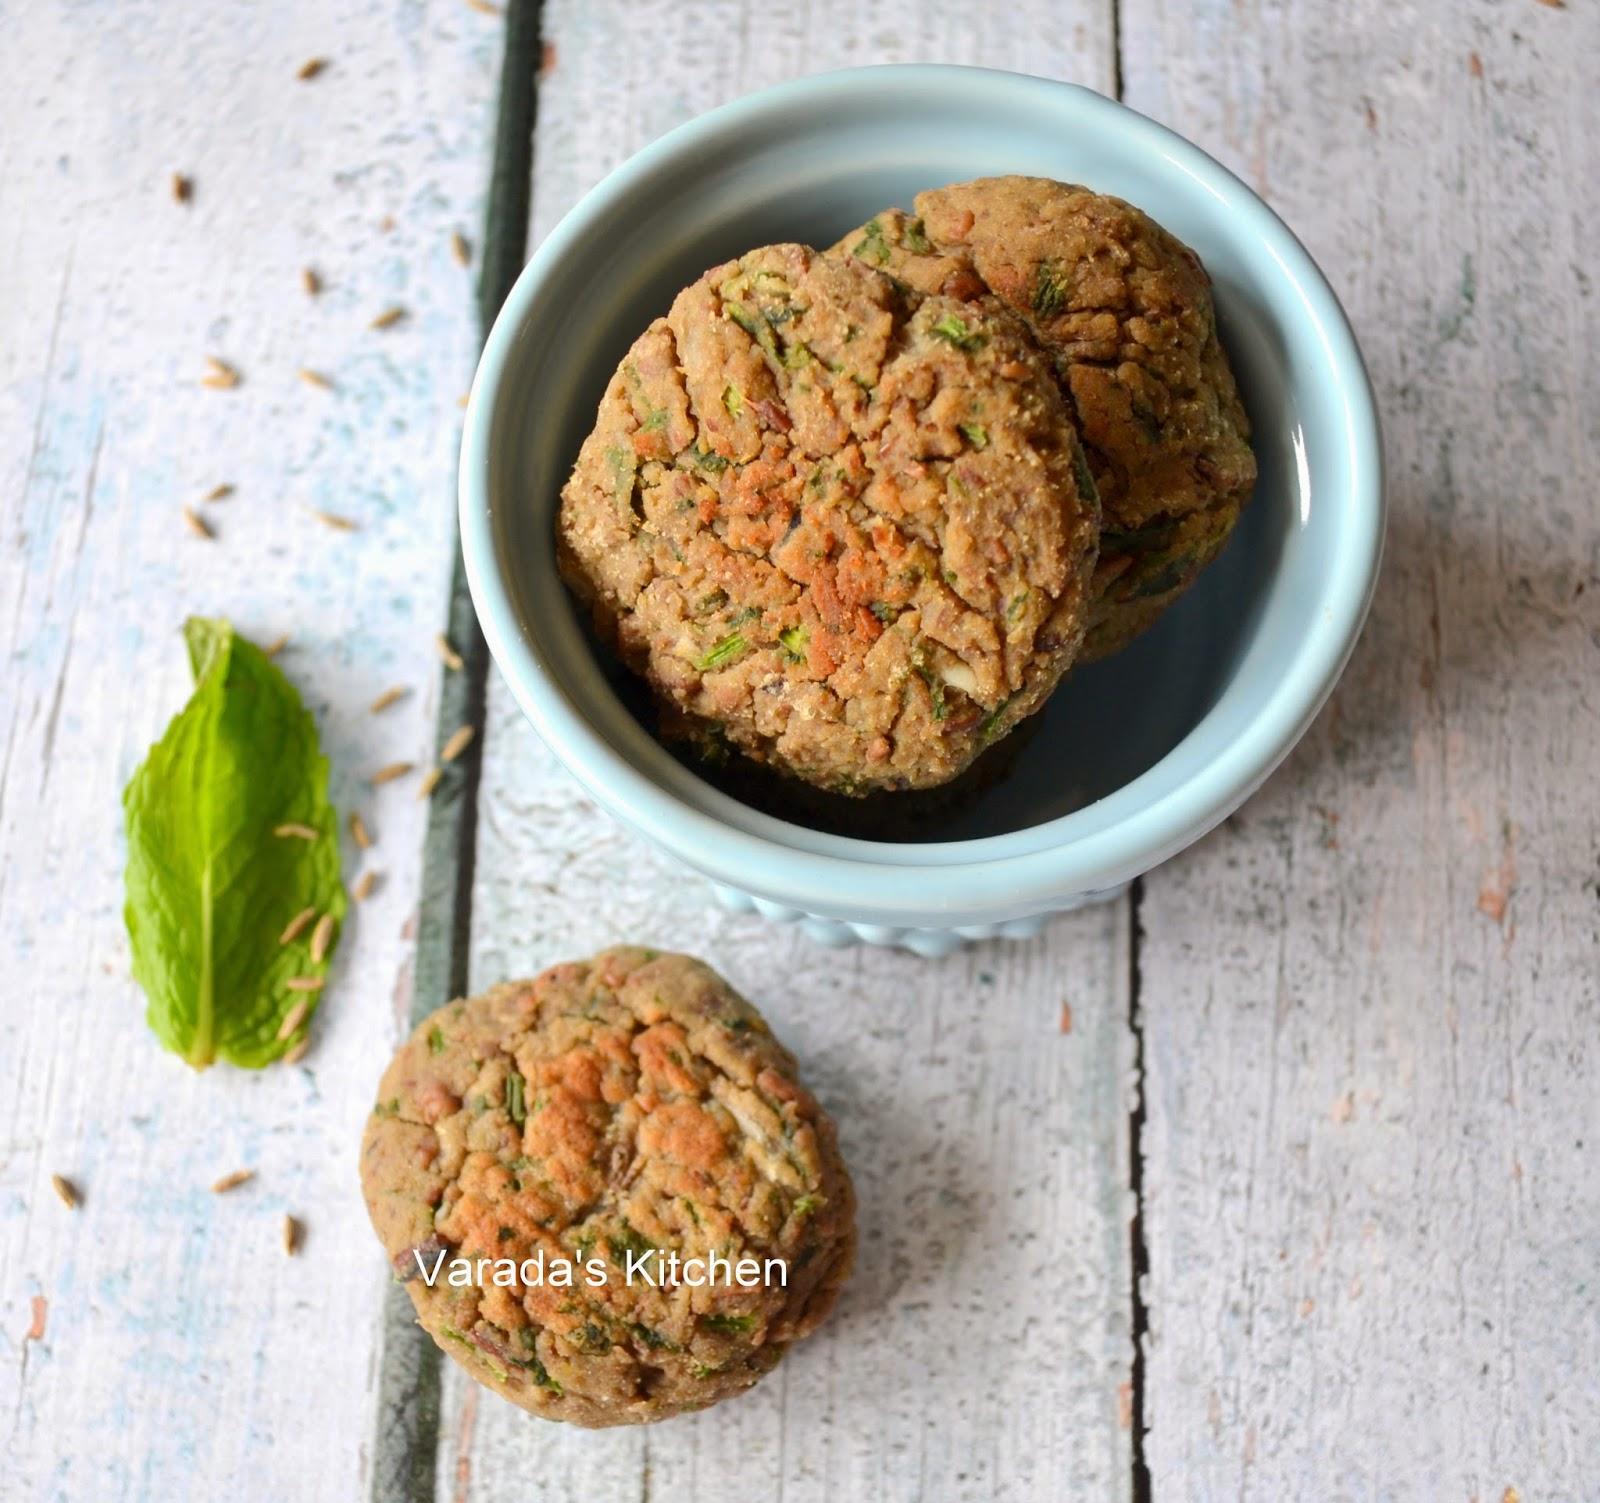 Varada's Kitchen: Ta'amiya / Fava Bean Falafel